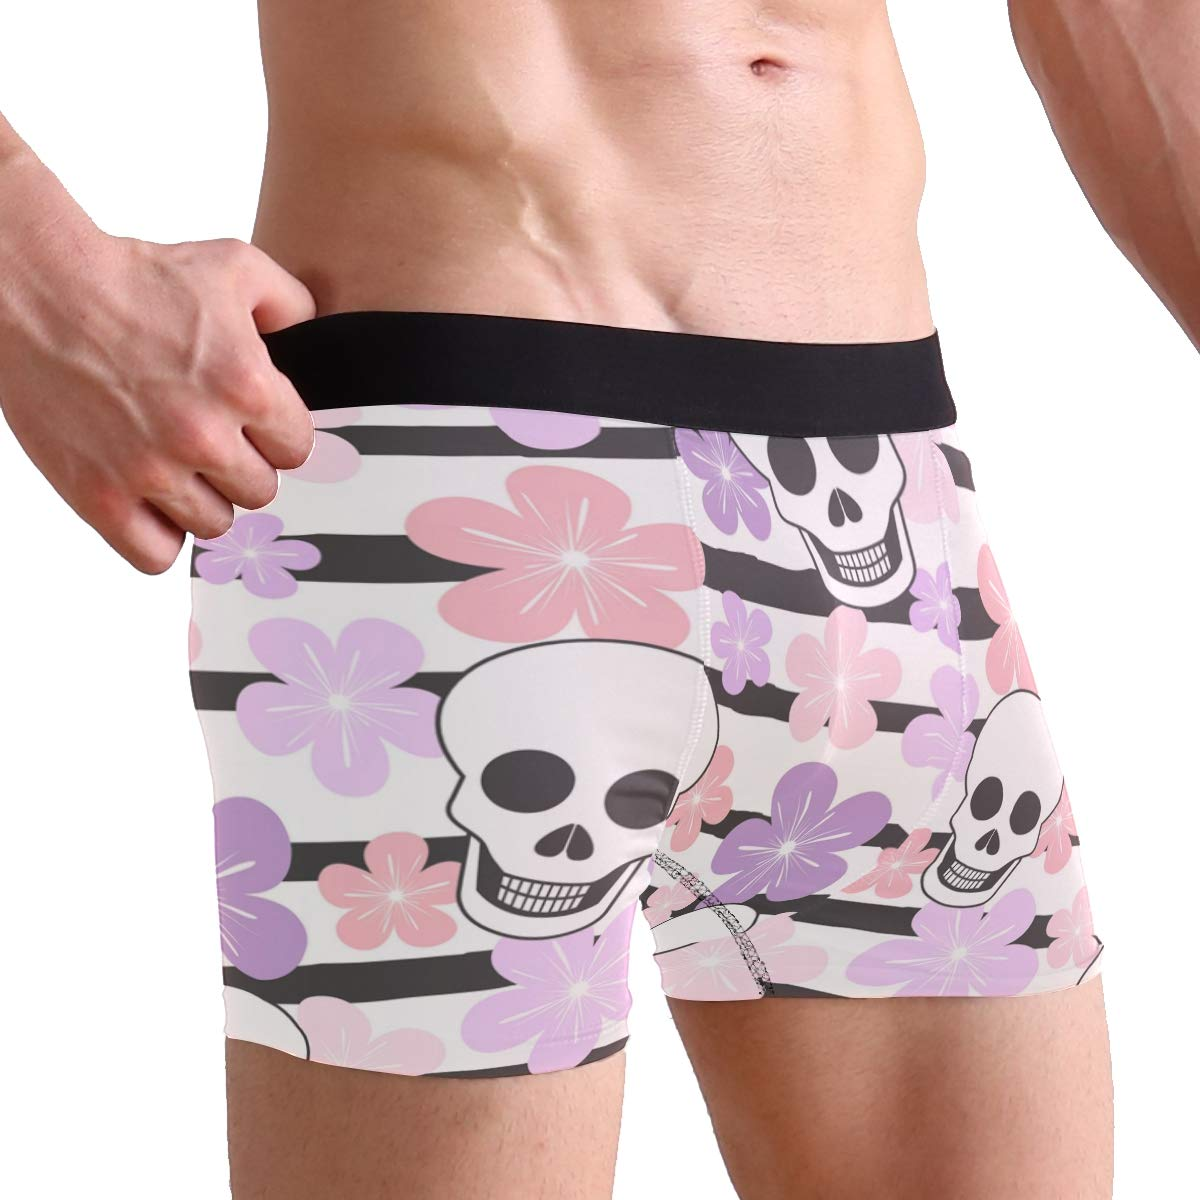 Mens Underwear Cute Skulls Colorful Striped Boys Boxer Brief